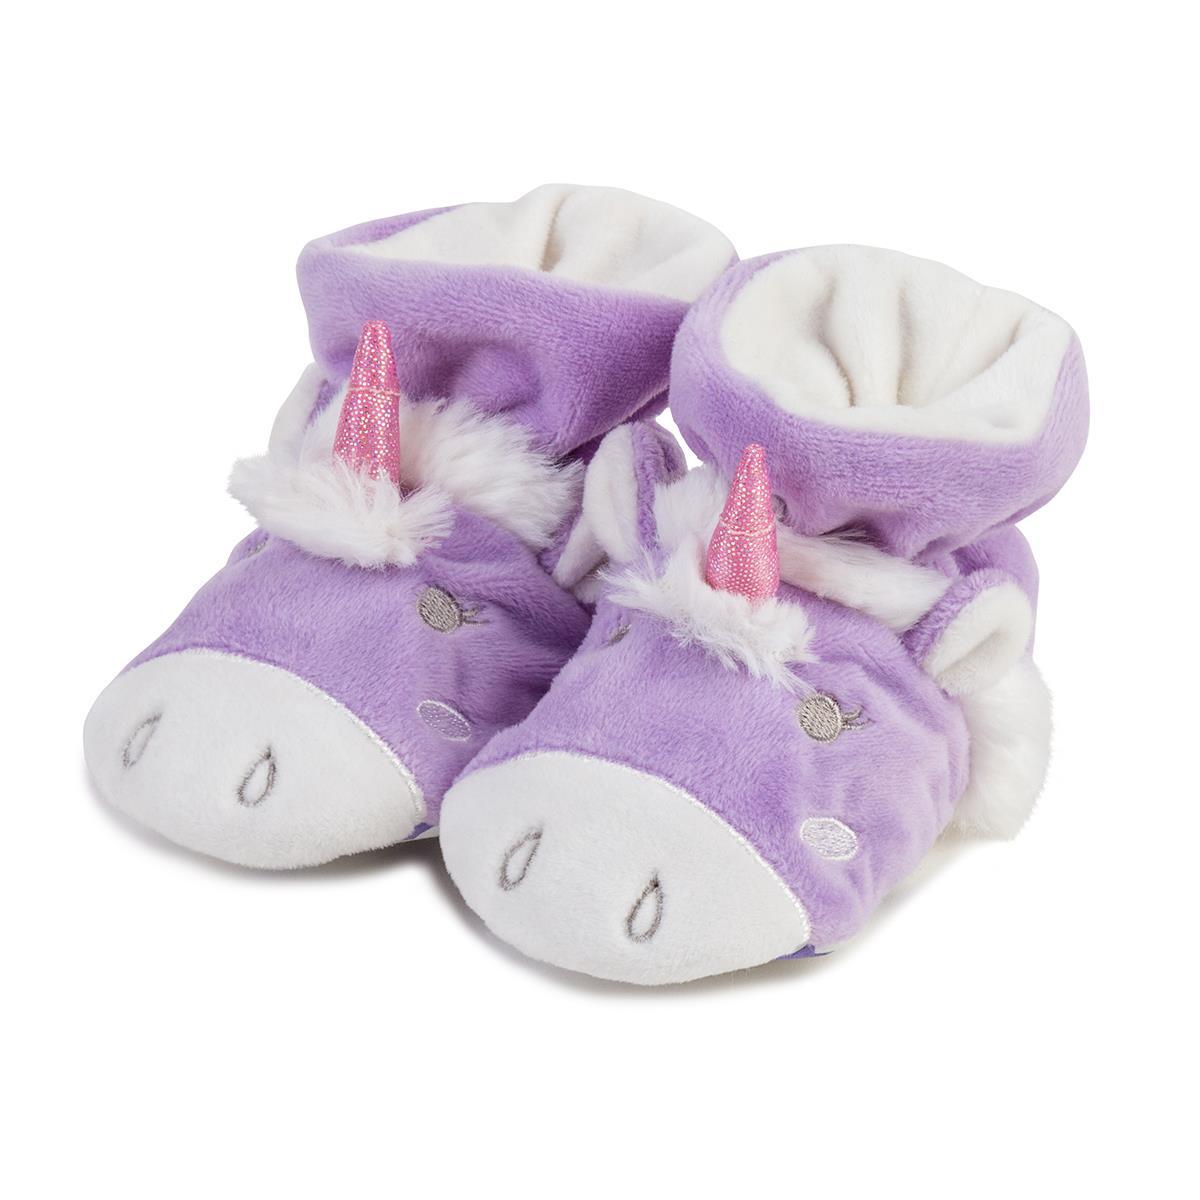 ae92aa40cad7 totes Girls Novelty Unicorn Slippers